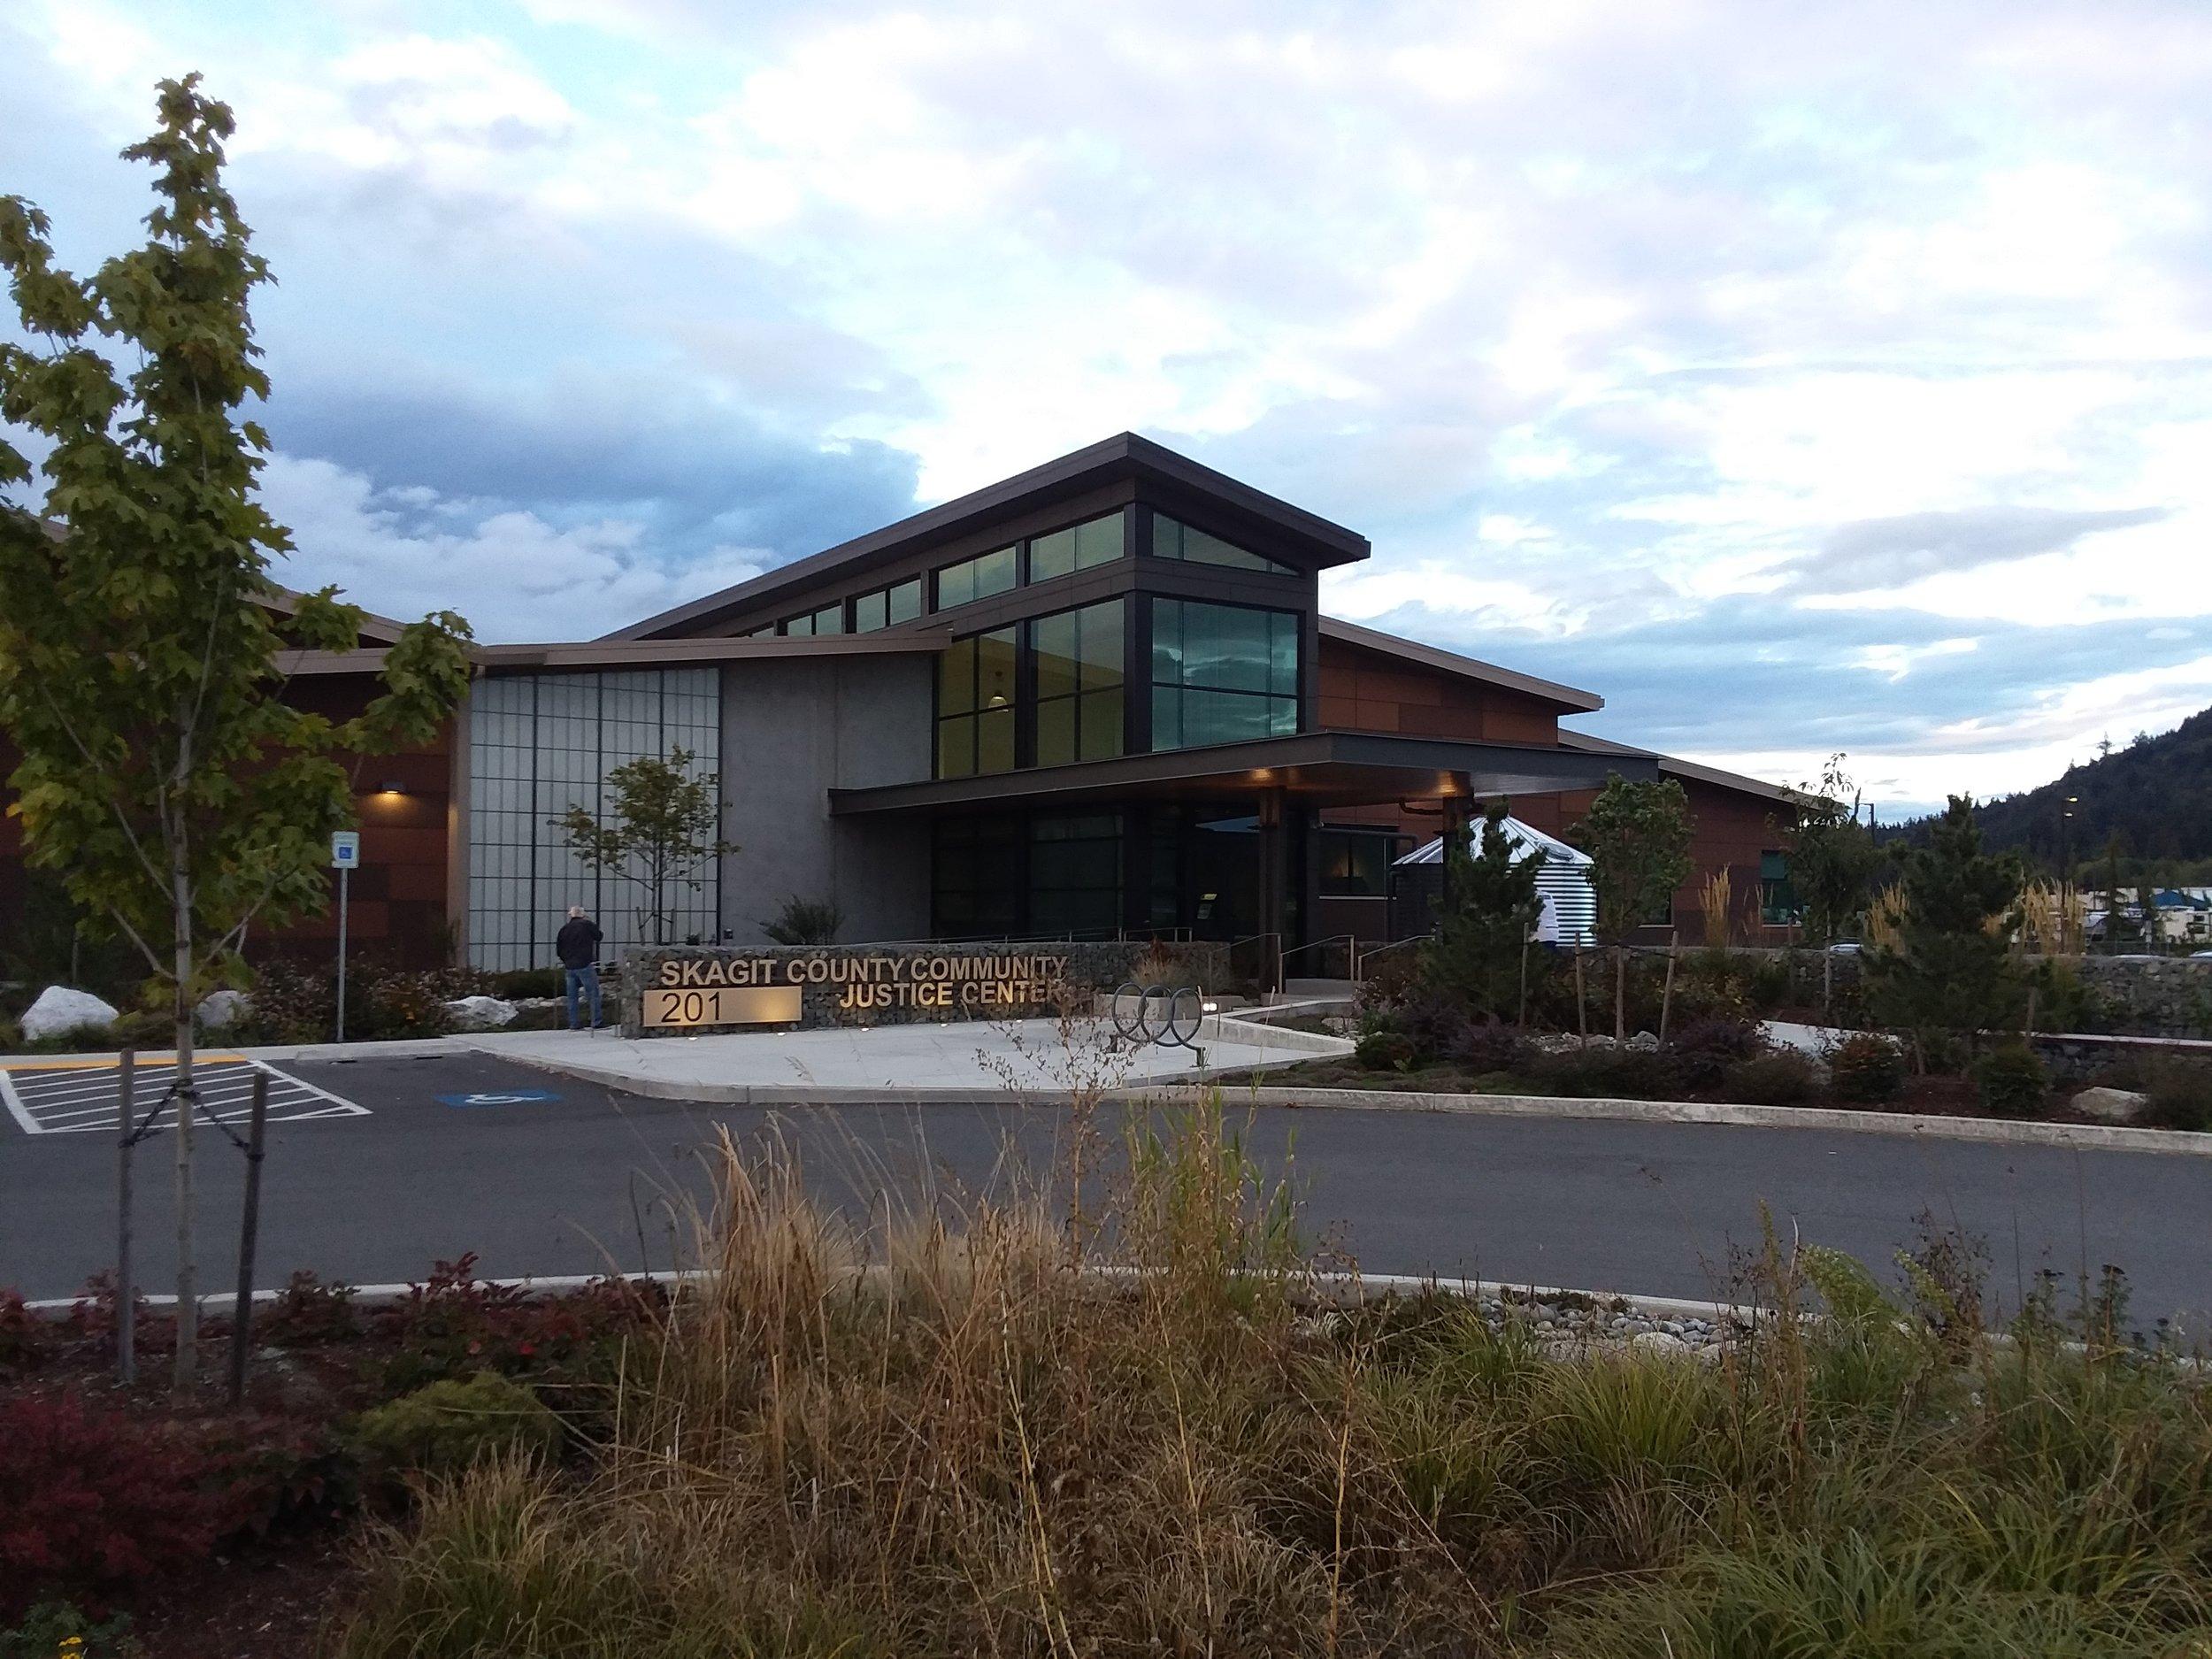 Skagit County Community Justice Center - Mount Vernon, WA.jpg